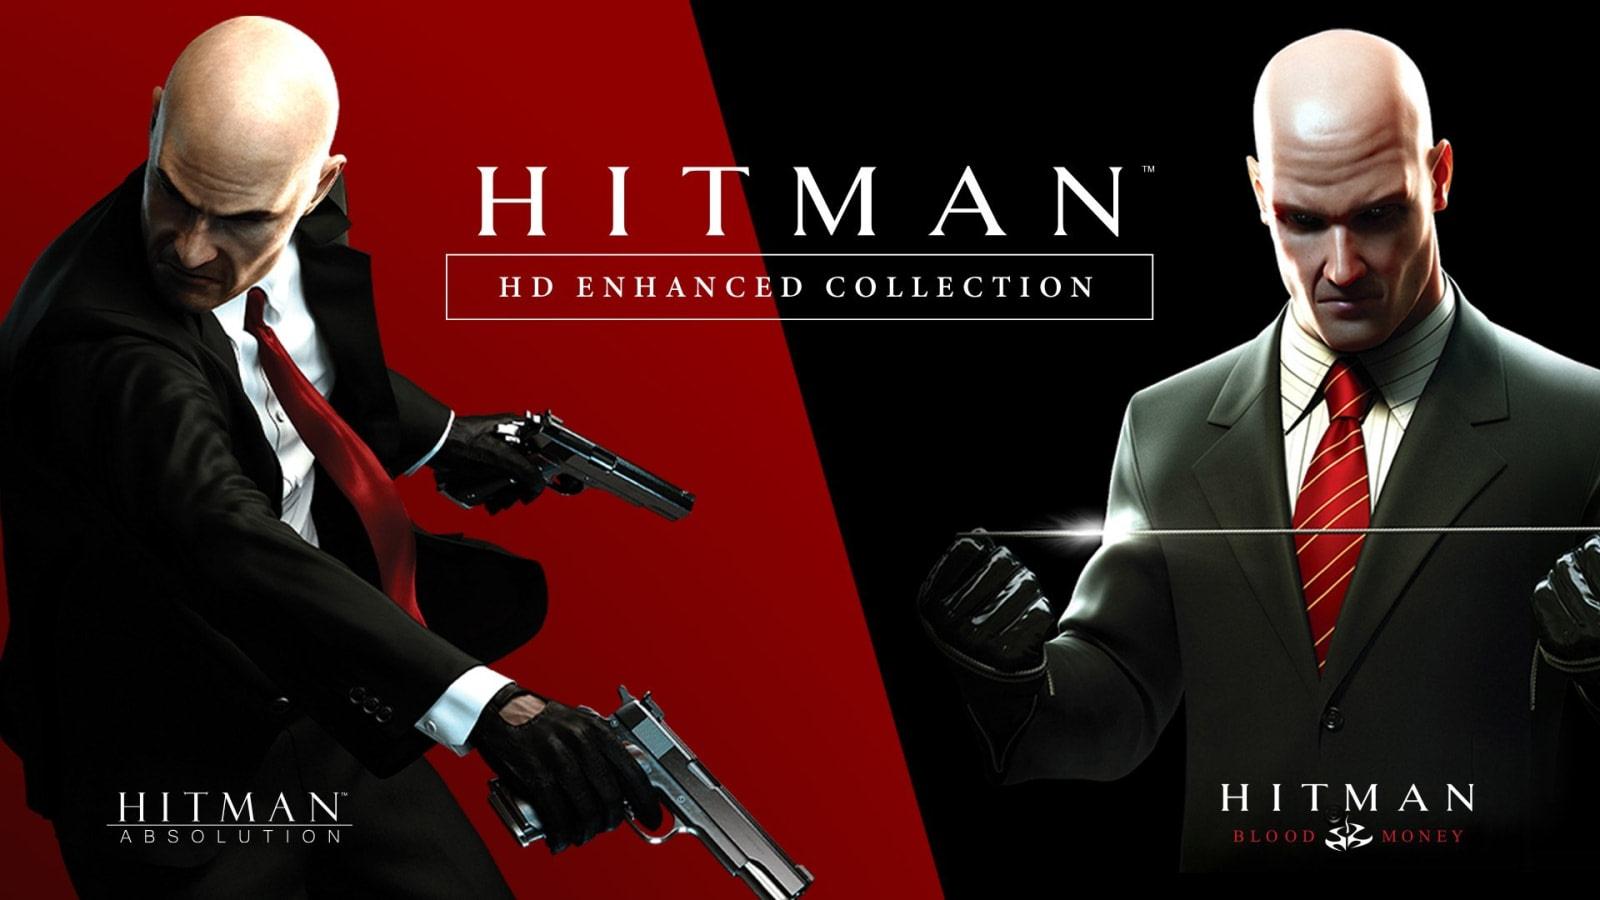 hitman blood money download full version pc